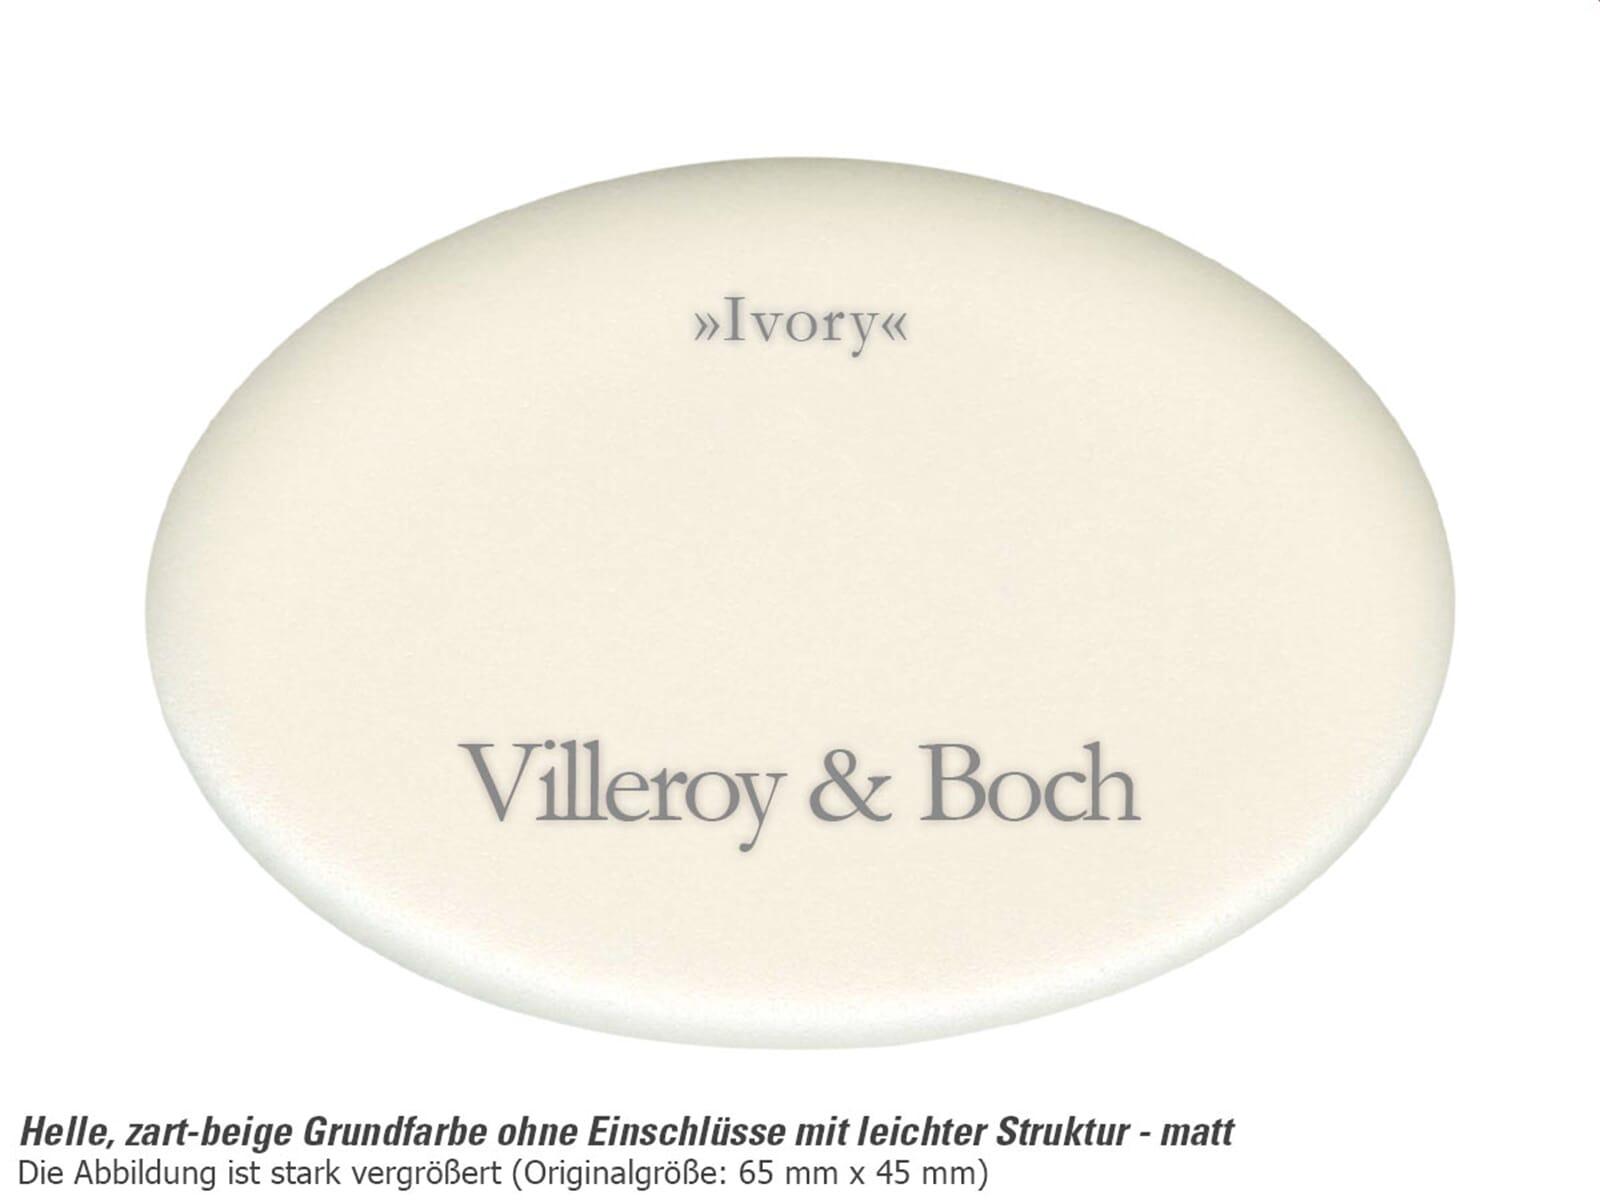 Villeroy & Boch Subway 45 Ivory - 6772 02 FU Keramikspüle Exzenterbetätigung